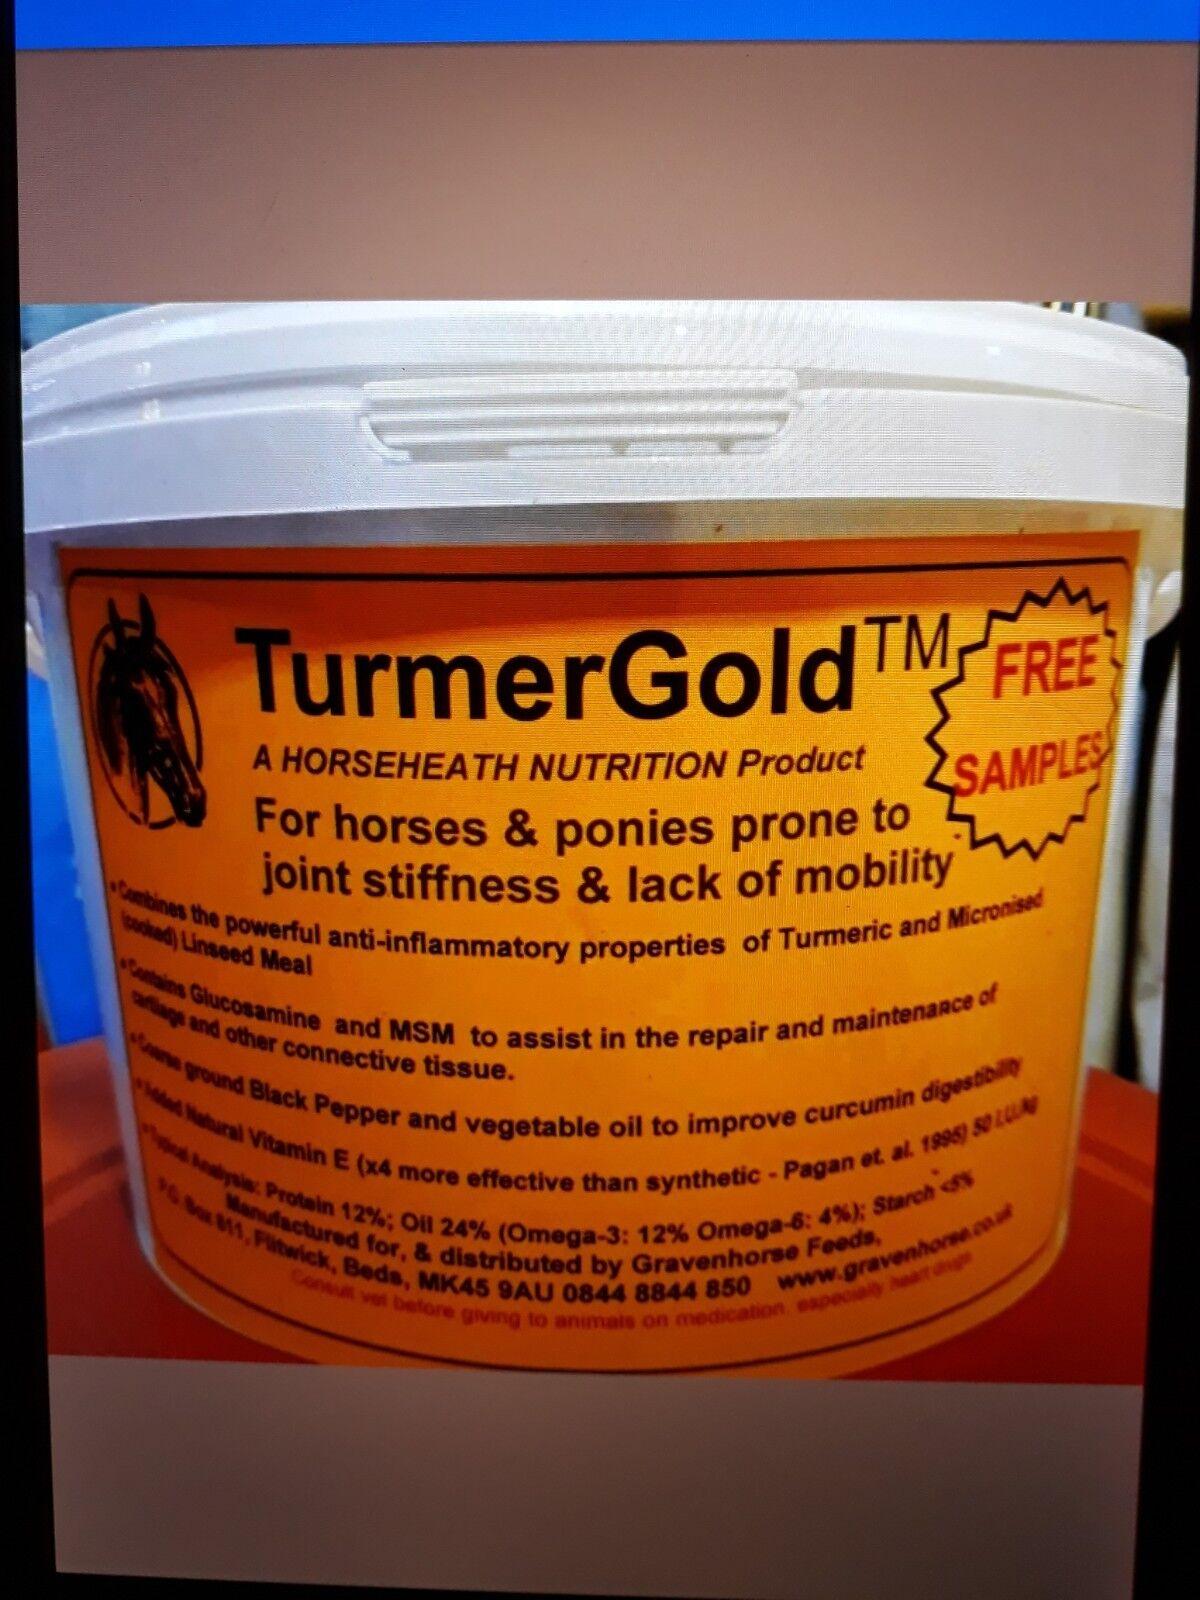 6 KG Turmer gold Turmeric Joint stiffness for Horses Glucosamine MSM Curcumin